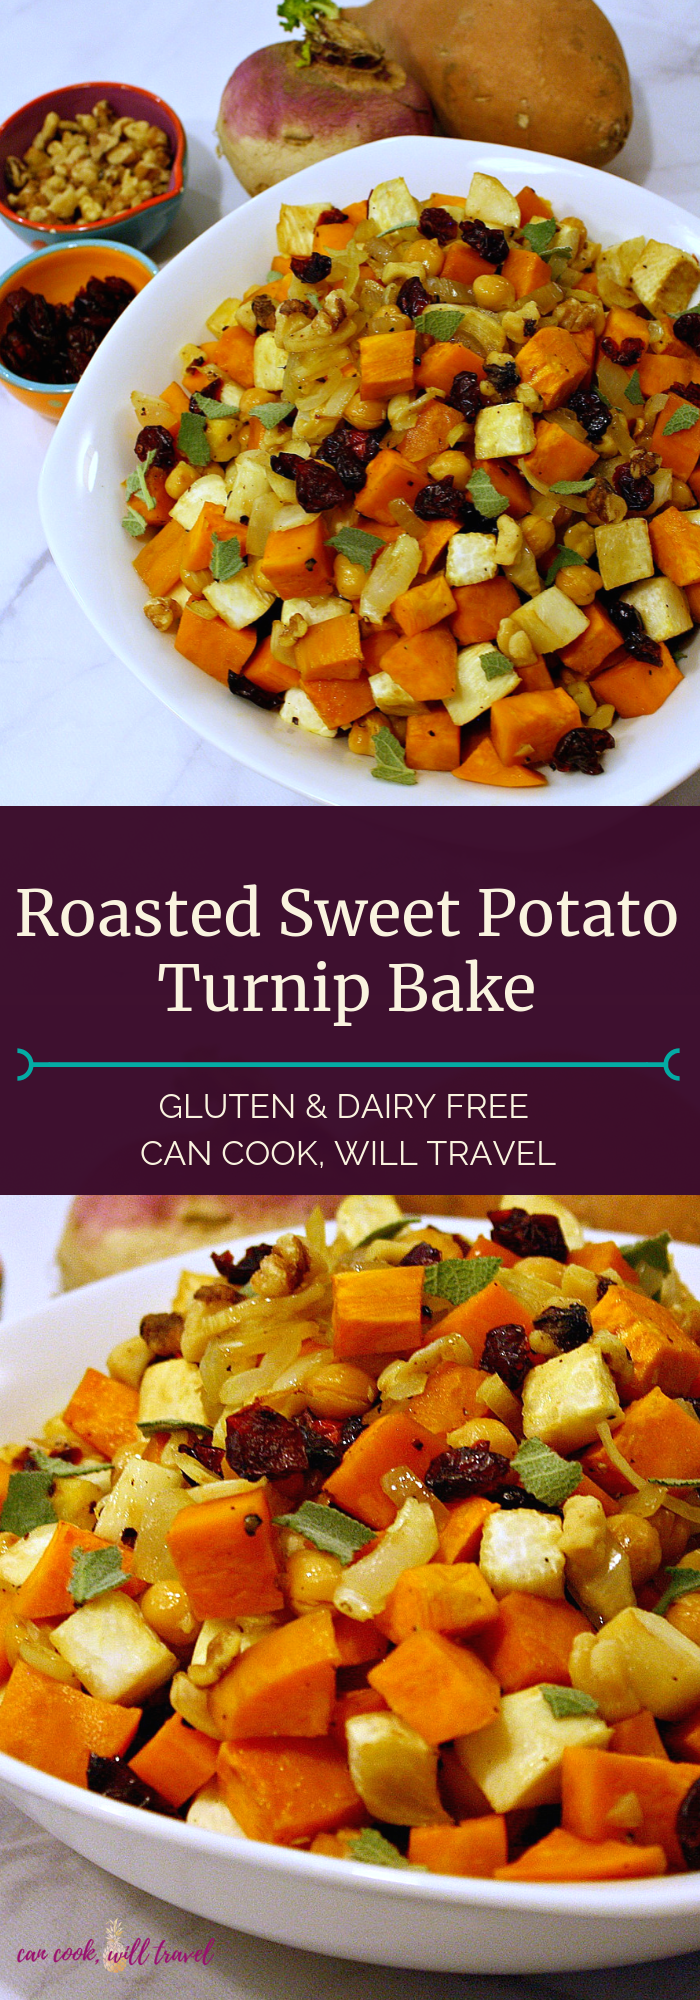 Roasted Sweet Potato Turnip Bake_Collage1